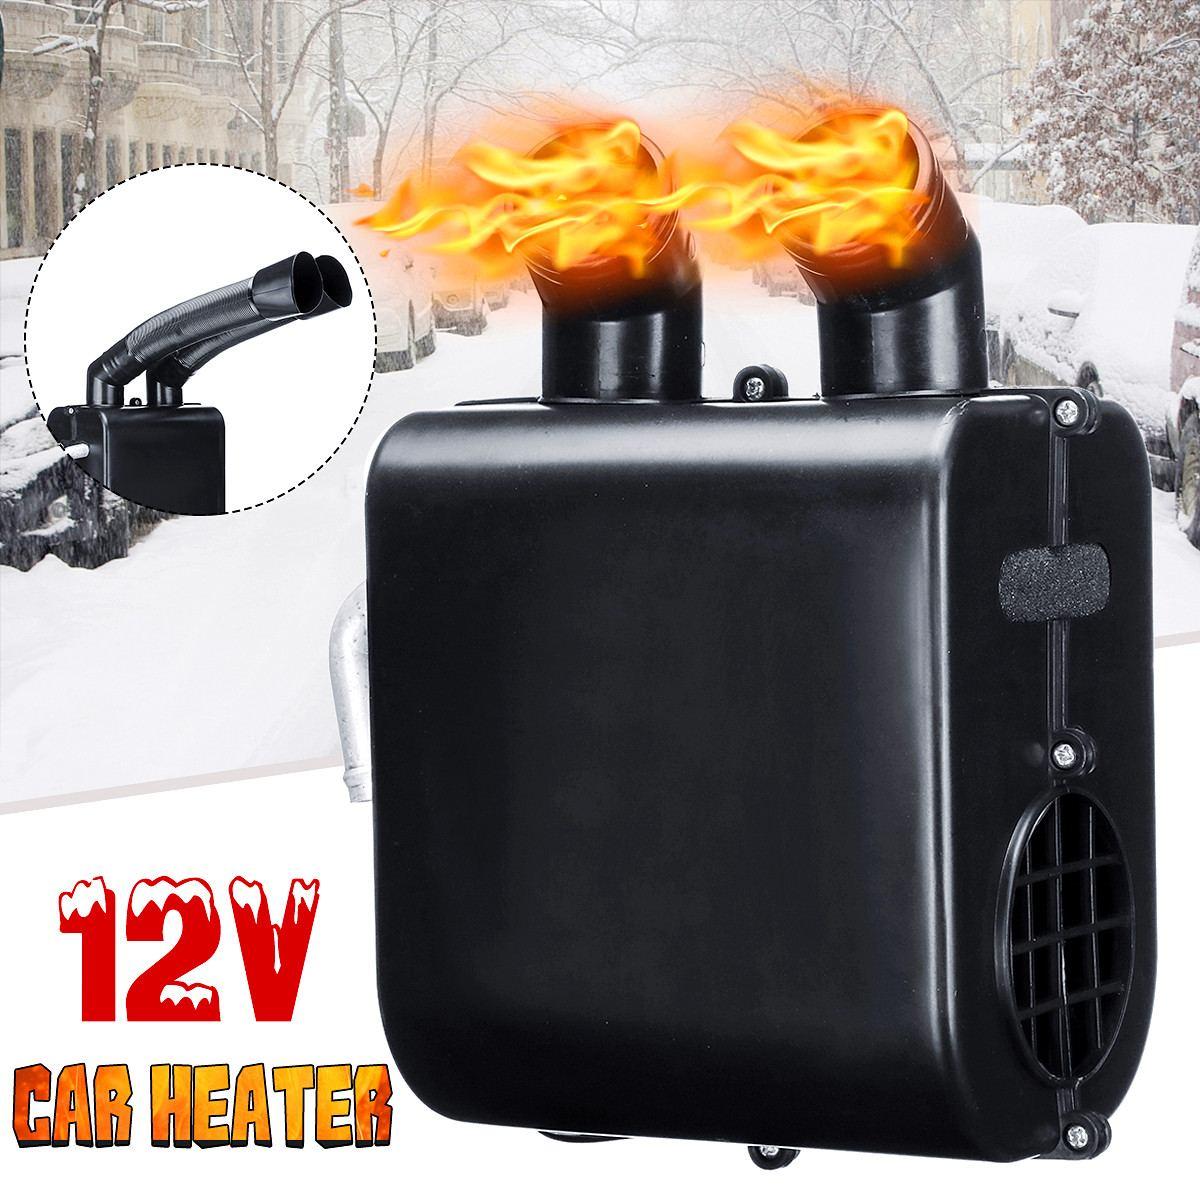 Vehicle Heat Cooling Fan Universal Windscreen Defroster Fast Heating Defogger Demister strety Car Heater Defroster 12V//24V 500W//800W Automobile Heater Fan